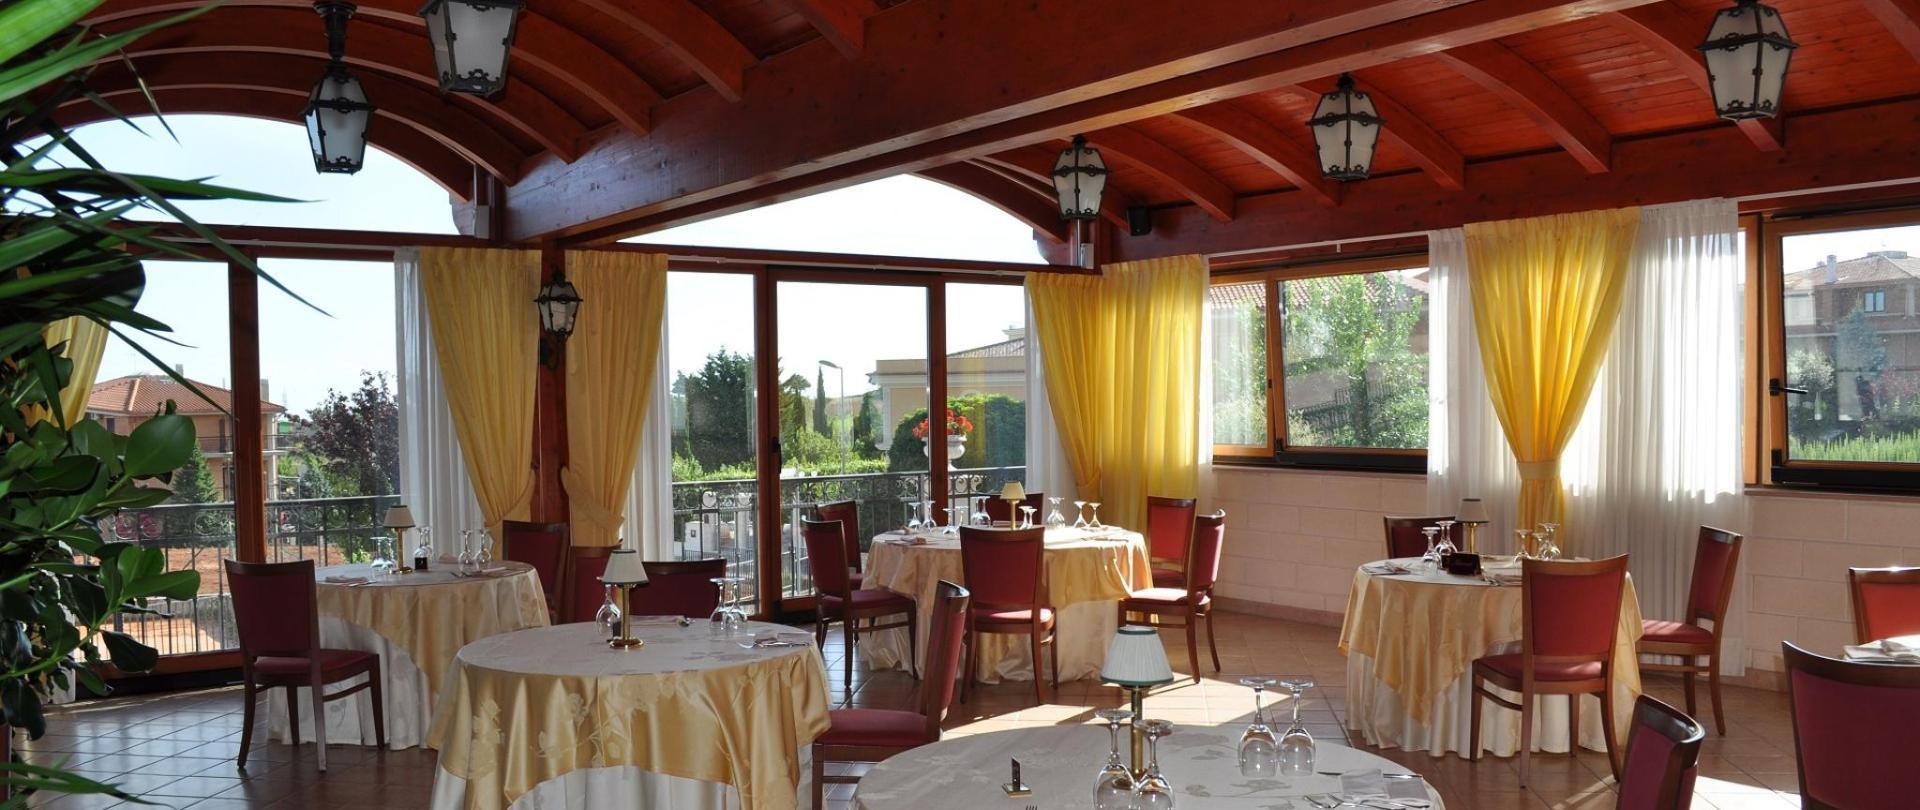 veranda-restavracija-romantična